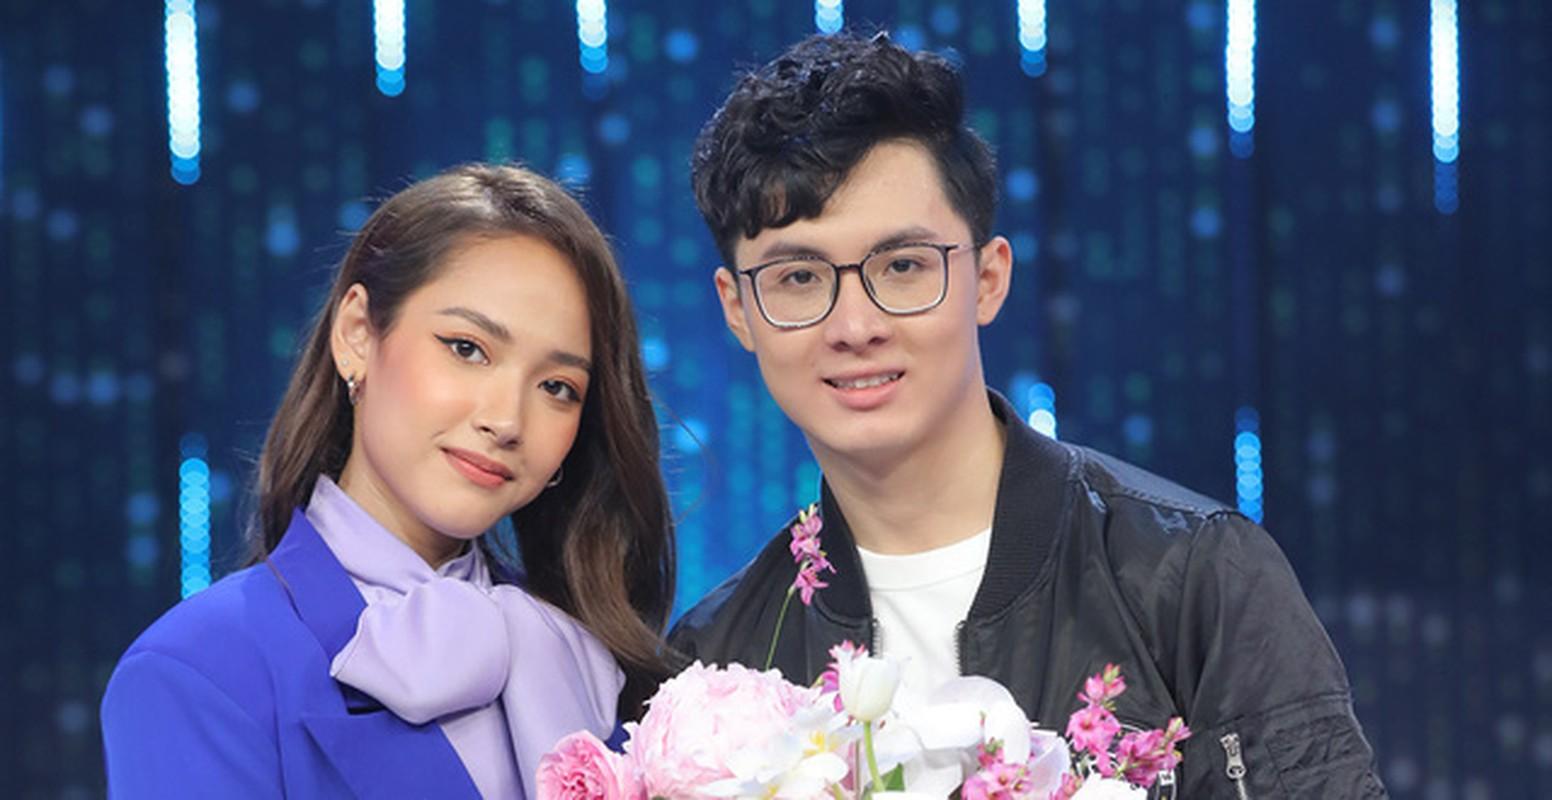 Khoe toc moi, streamer NoWay khien fan tuong nham Lee Min Ho-Hinh-5